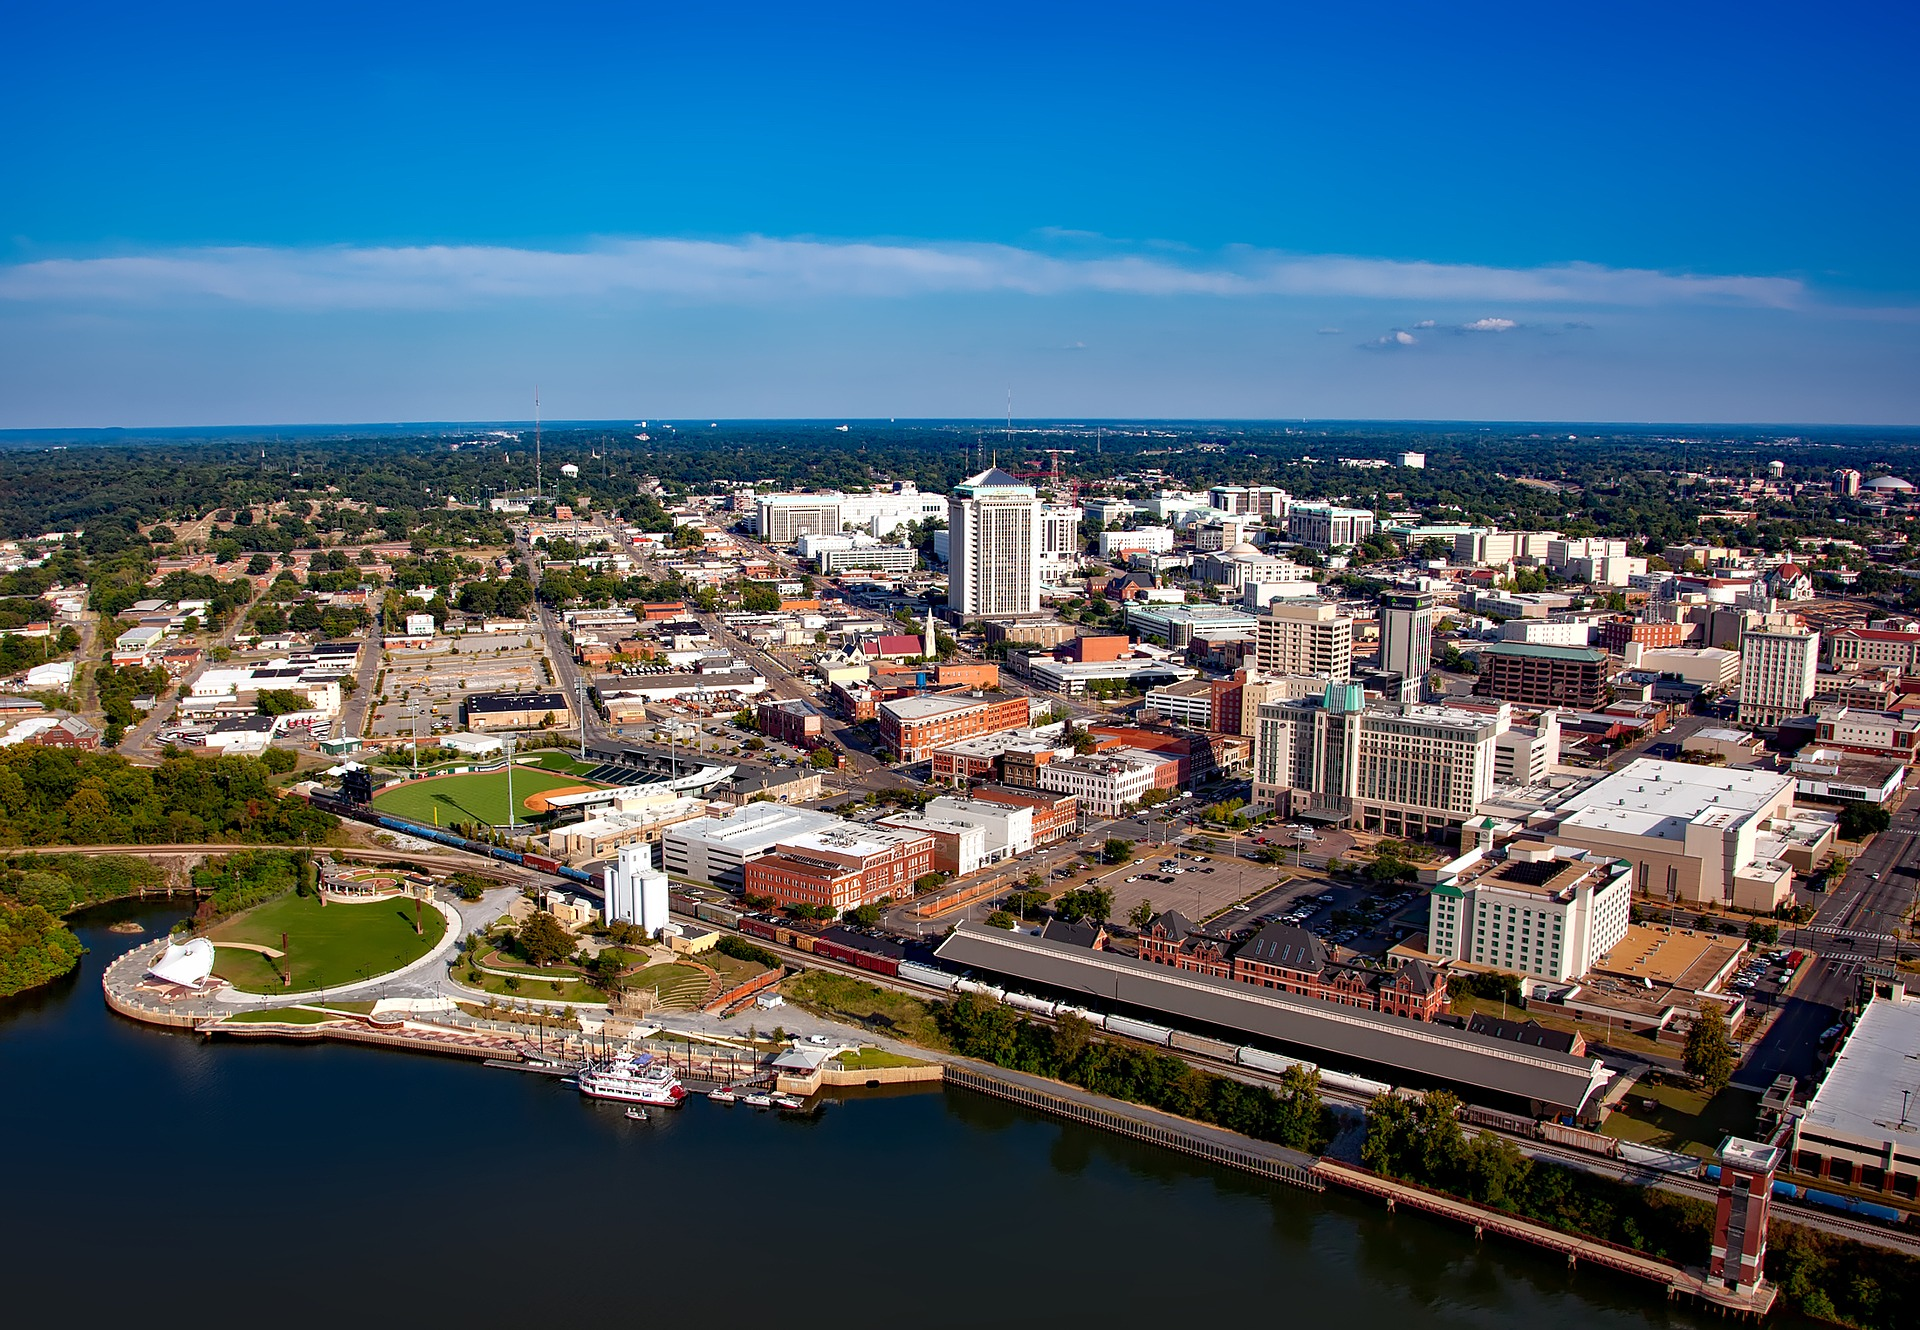 City of Montgomery (Alabama)